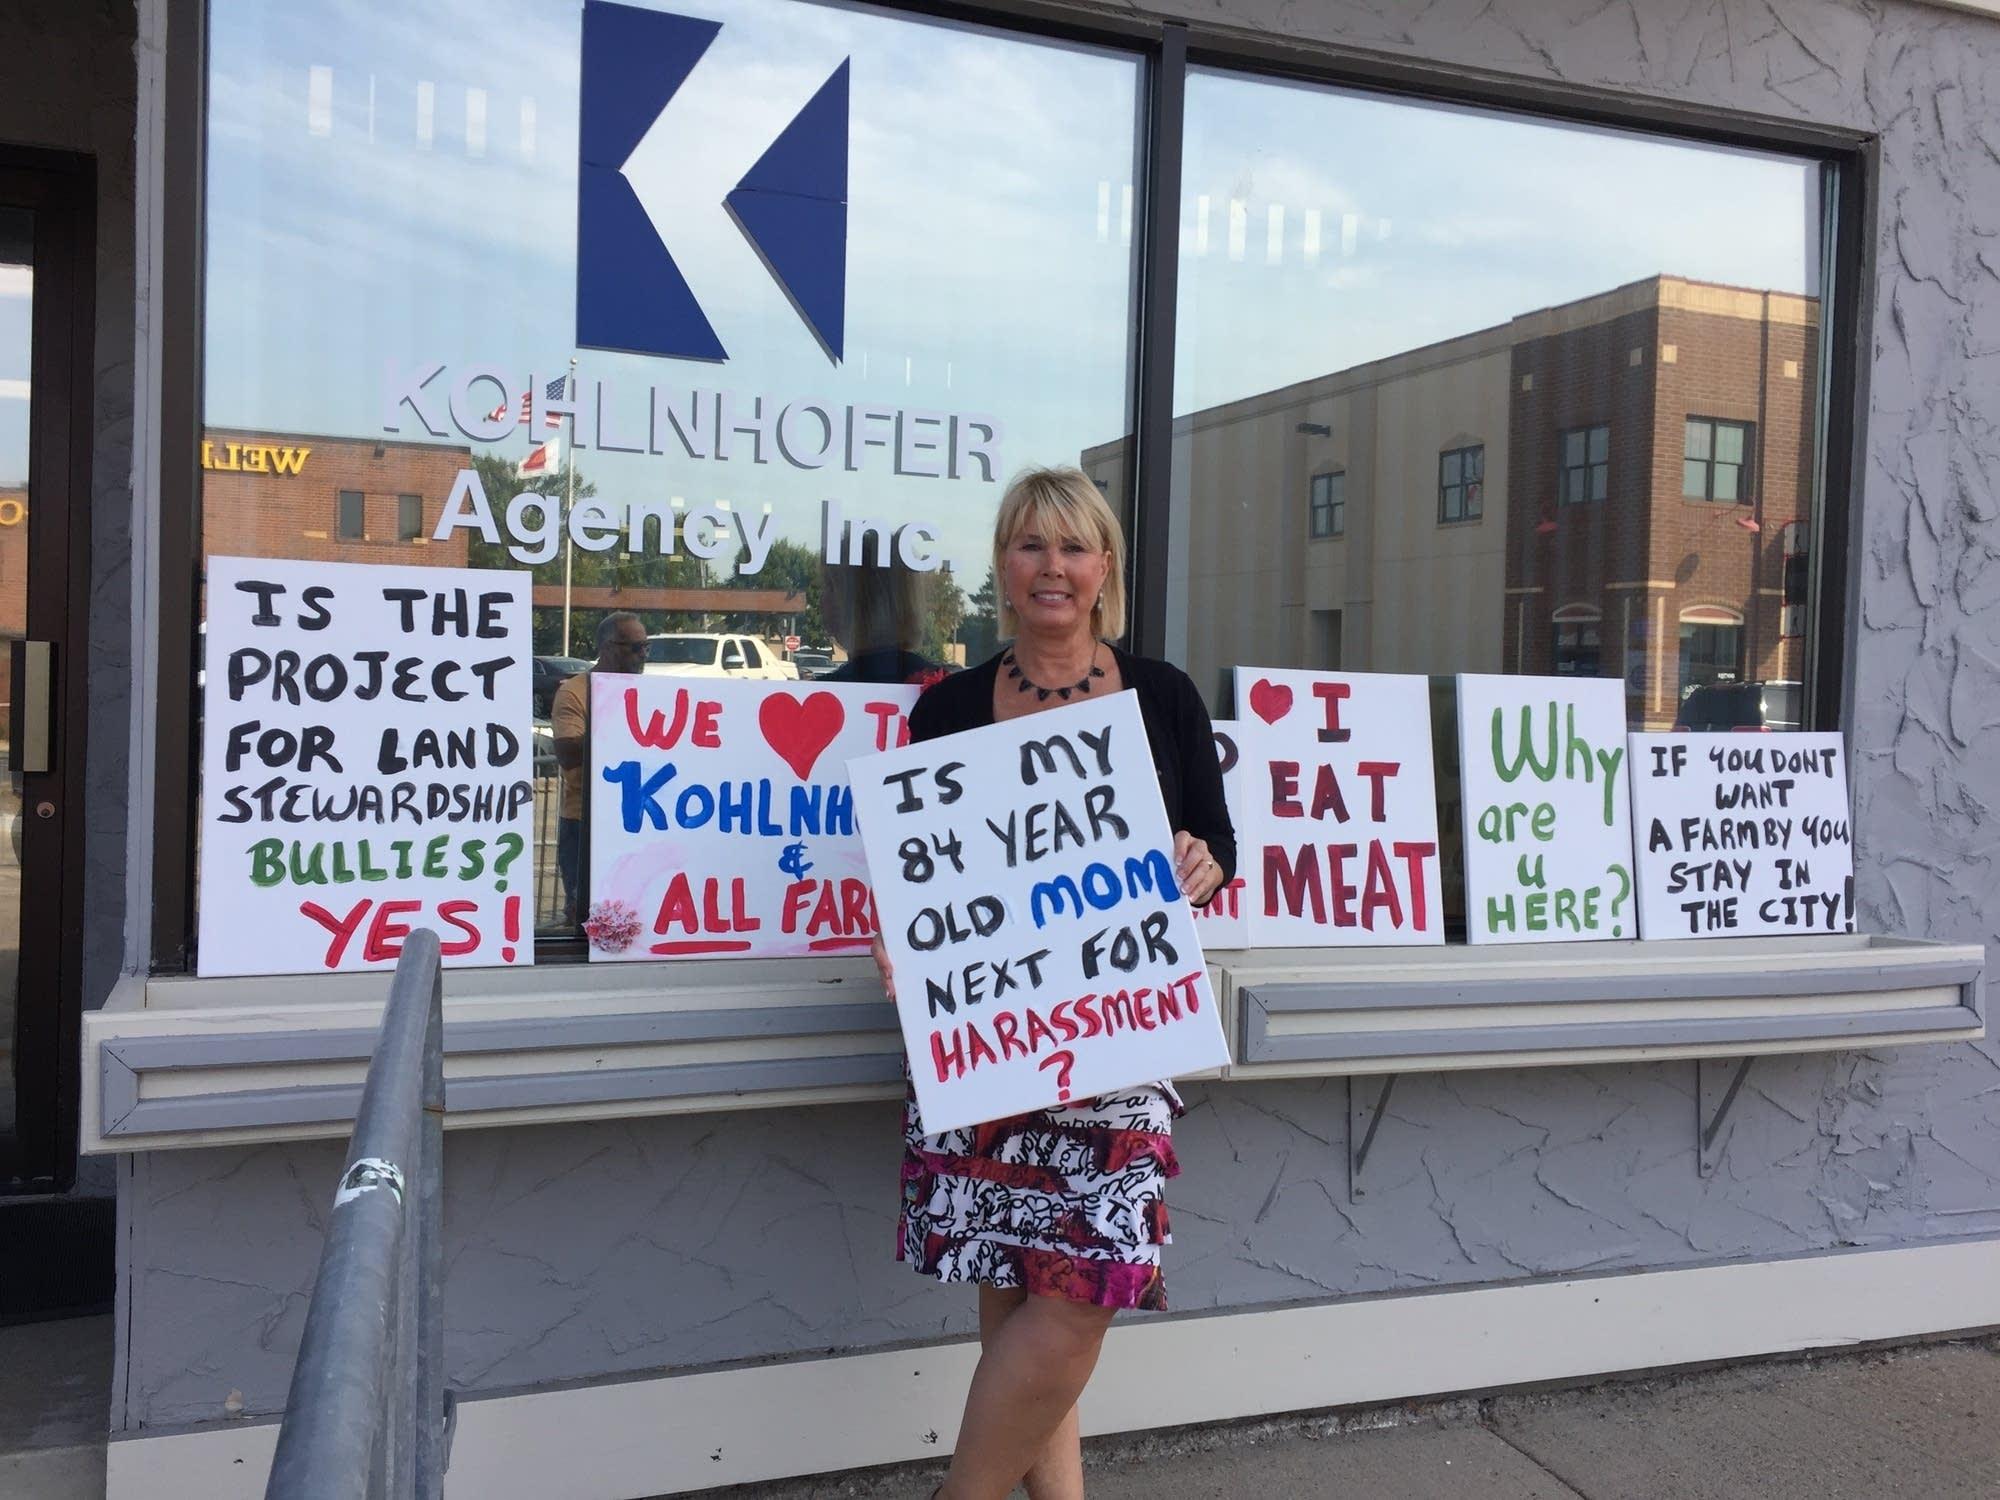 Beth Kohlnhofer Raskovich stands by her insurance agency in Lakeville